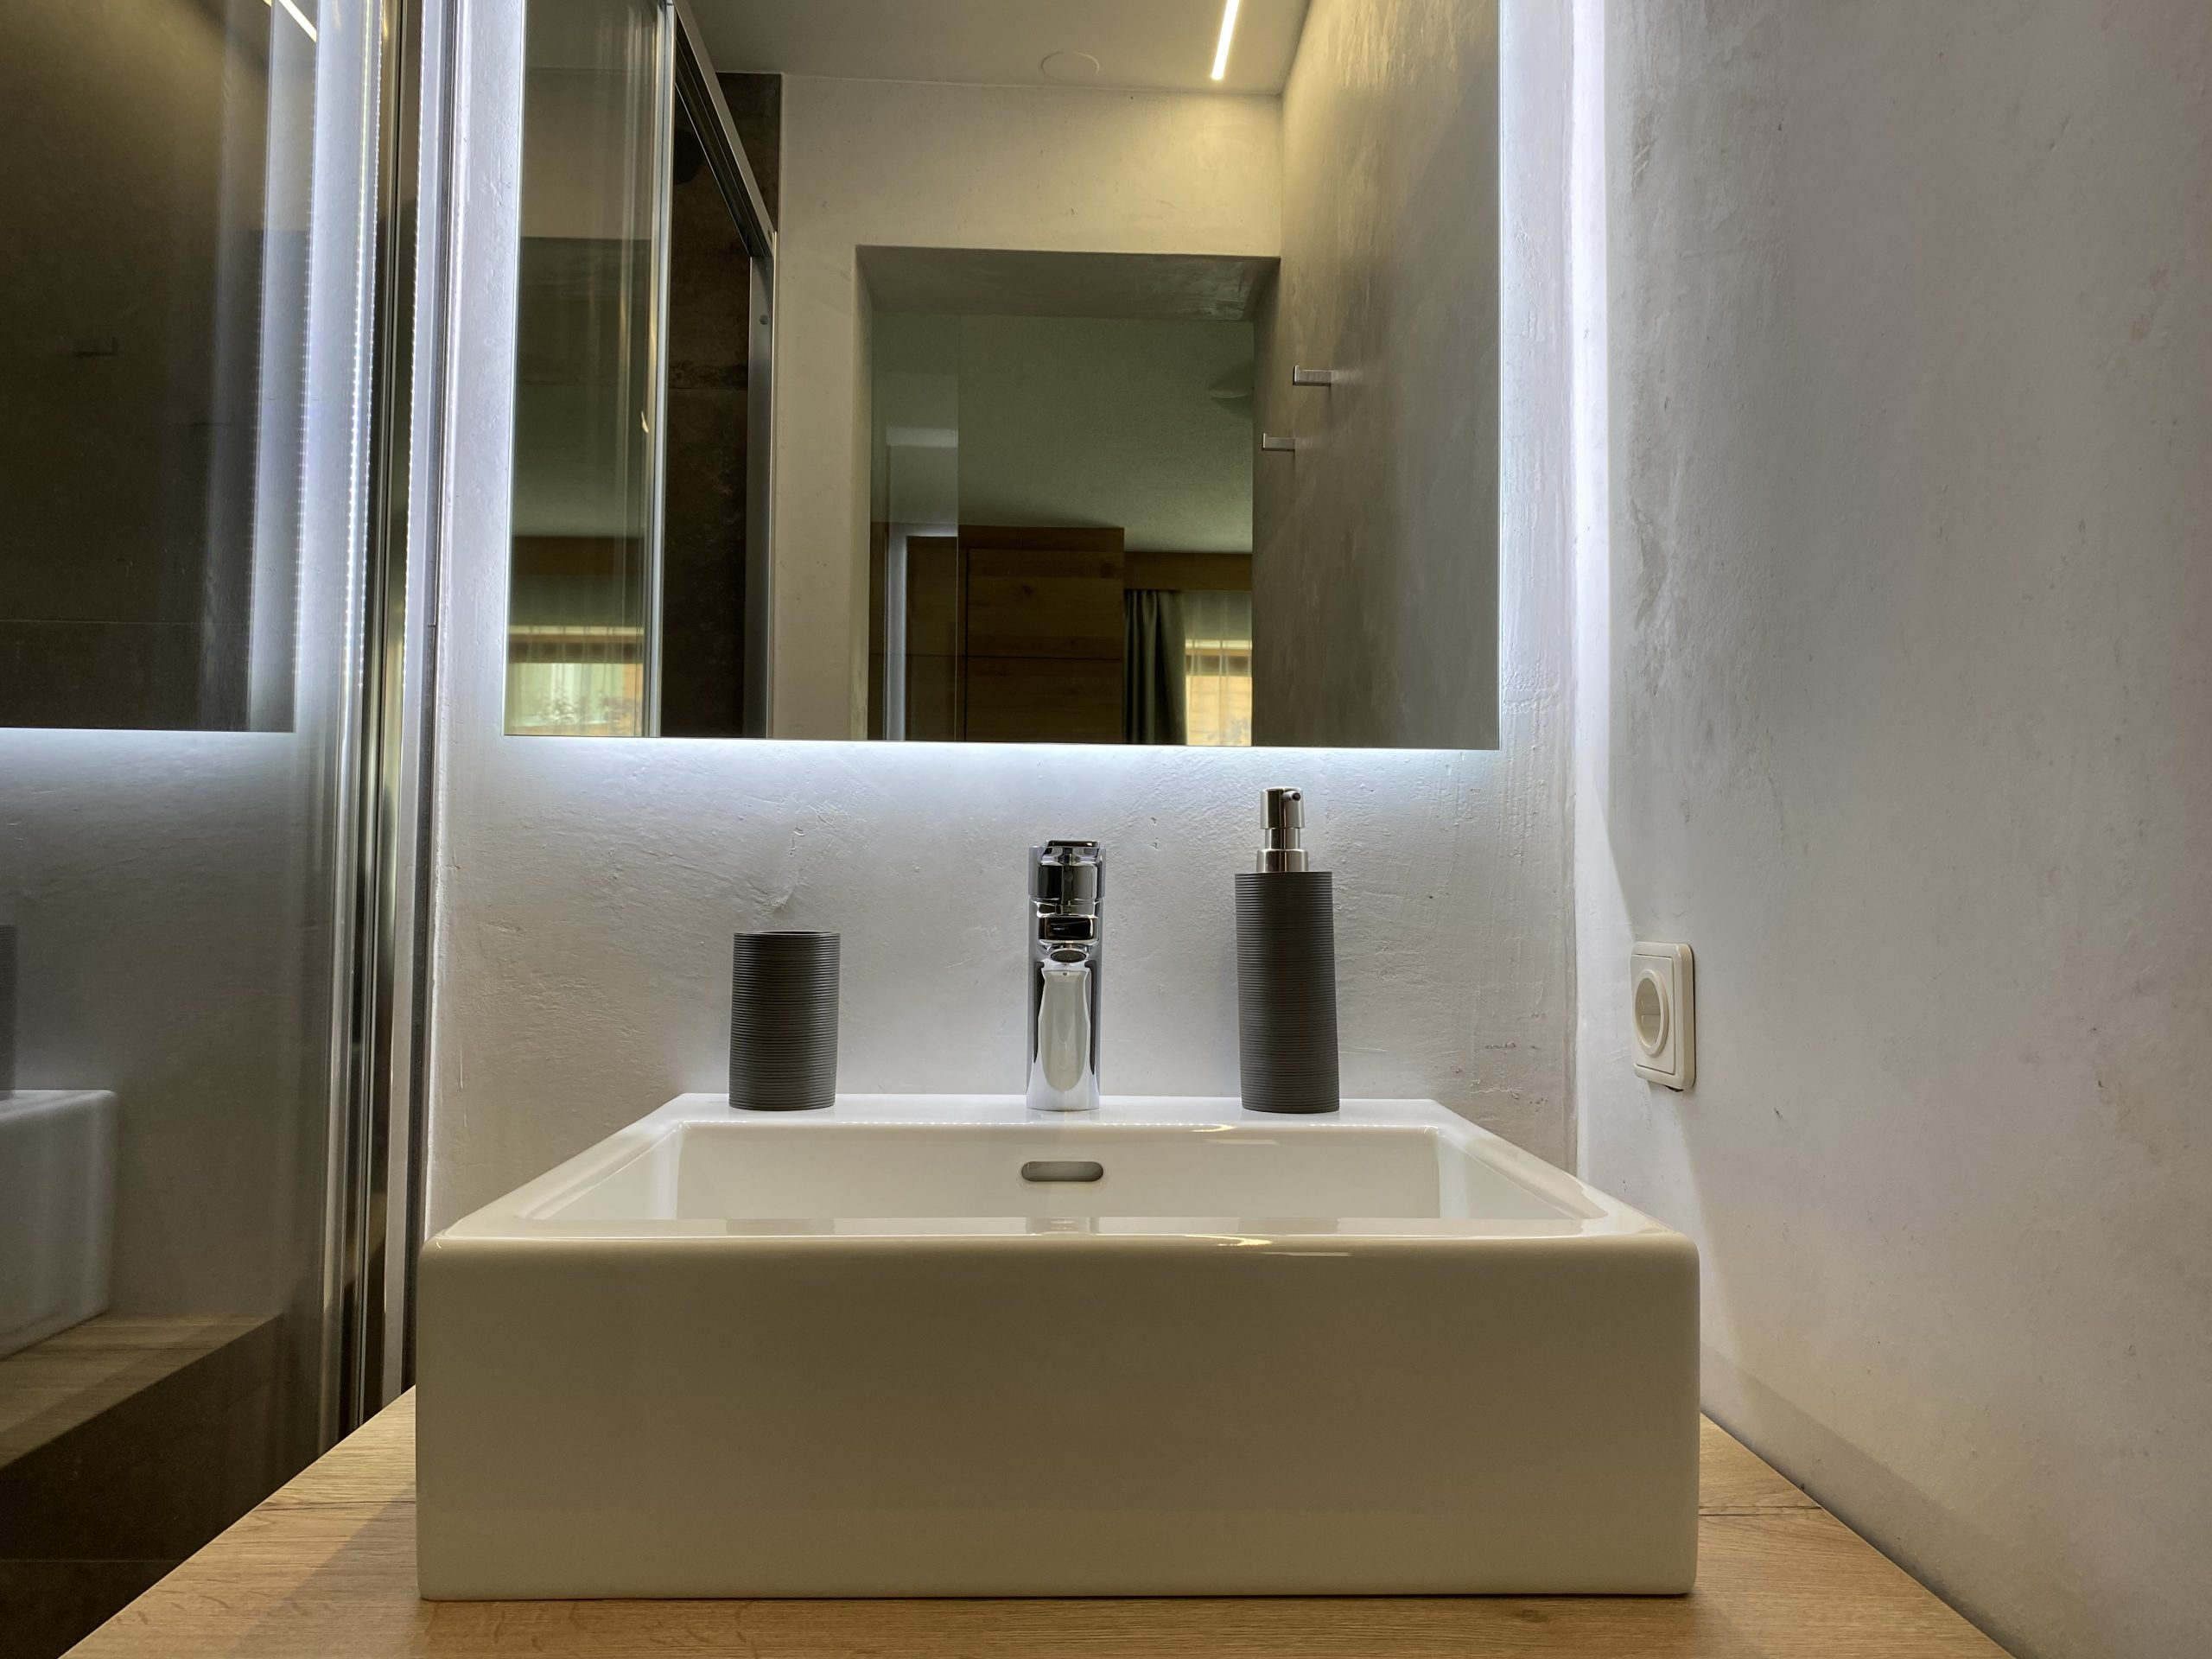 Apartment 3, bathroom 1